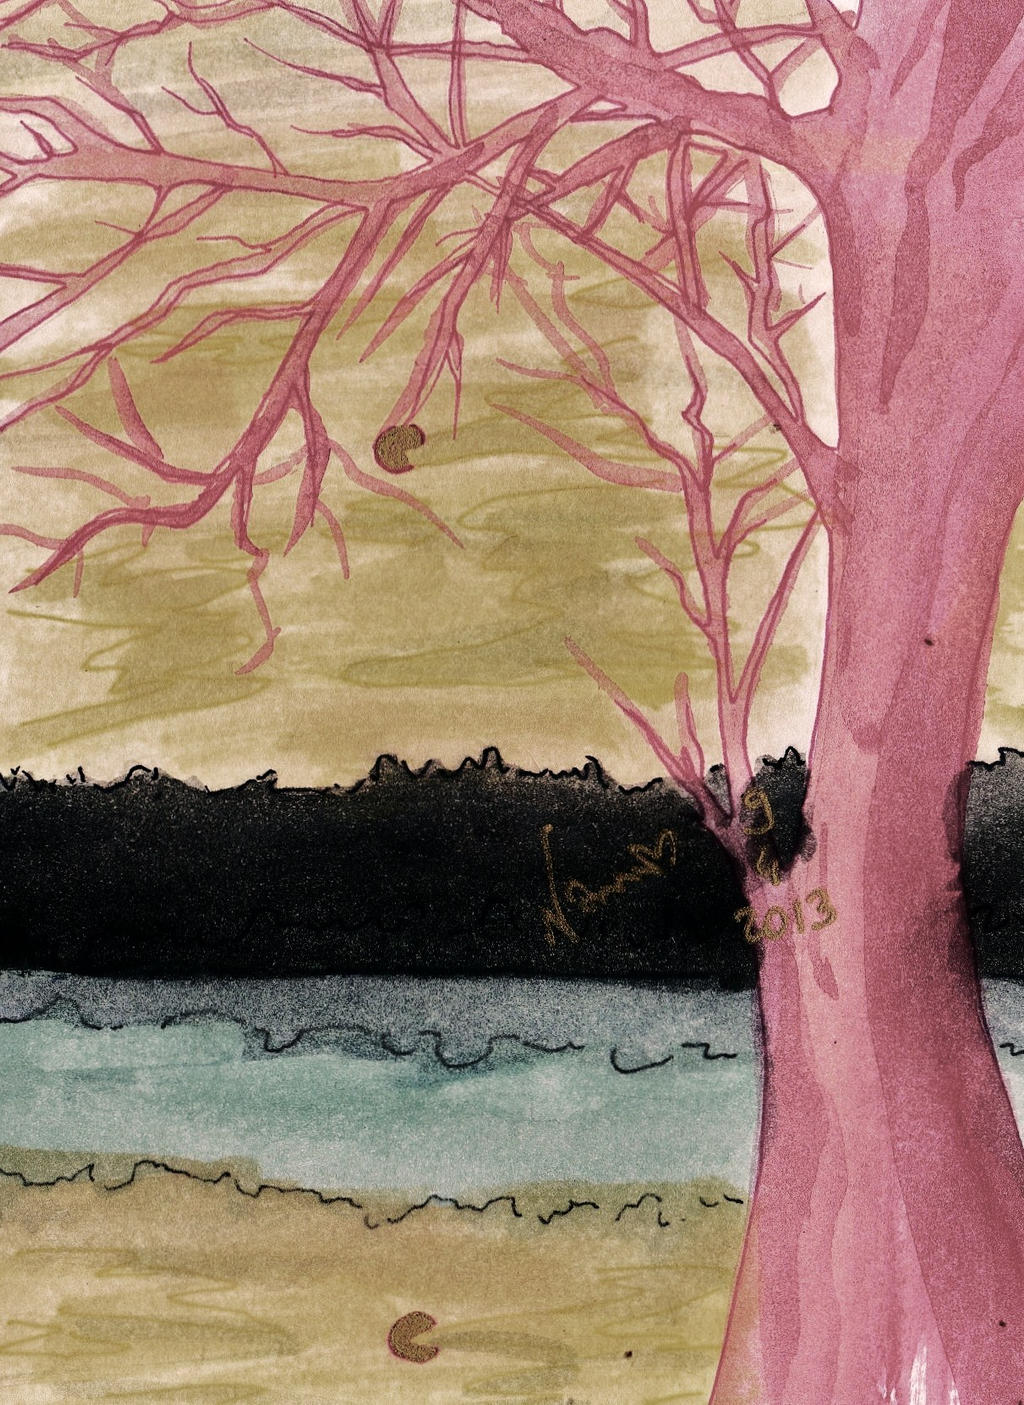 sad tree by NanakoHarrison